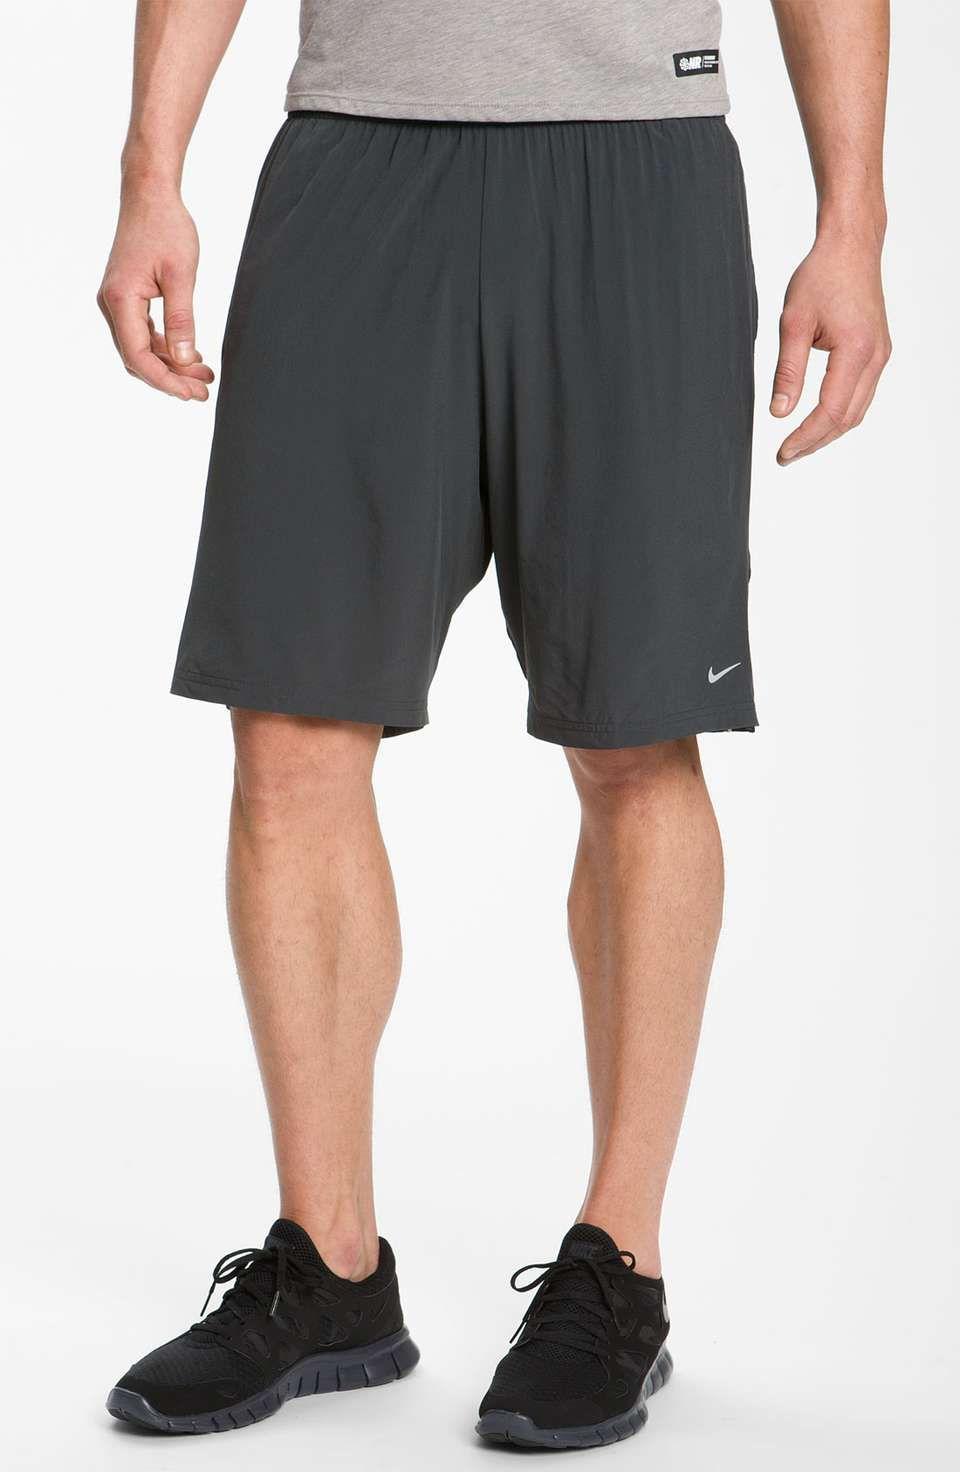 Nike DriFIT Woven Running Shorts Only) 40